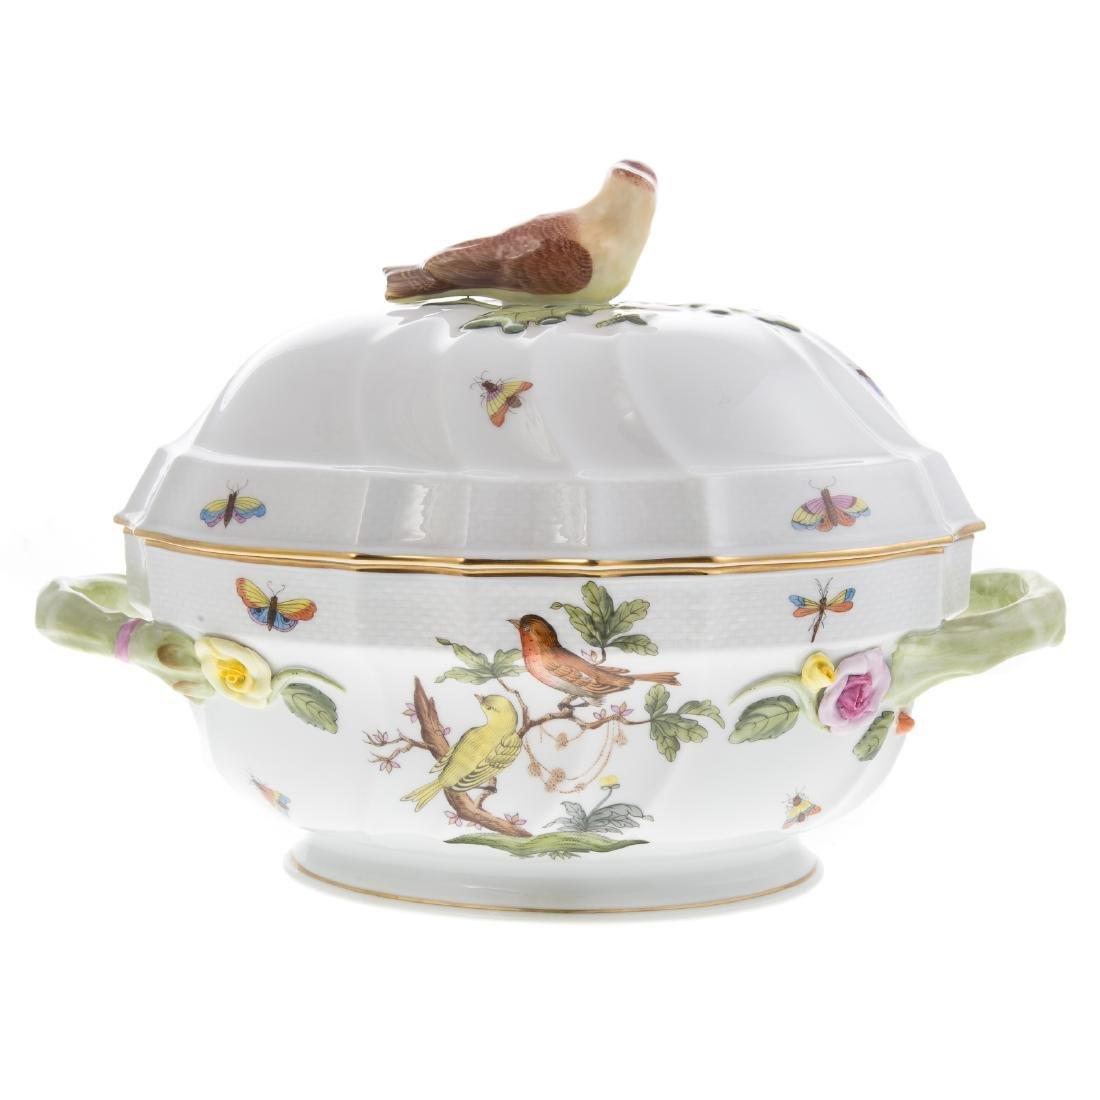 Herend Rothschild Bird soup tureen and platter - 5